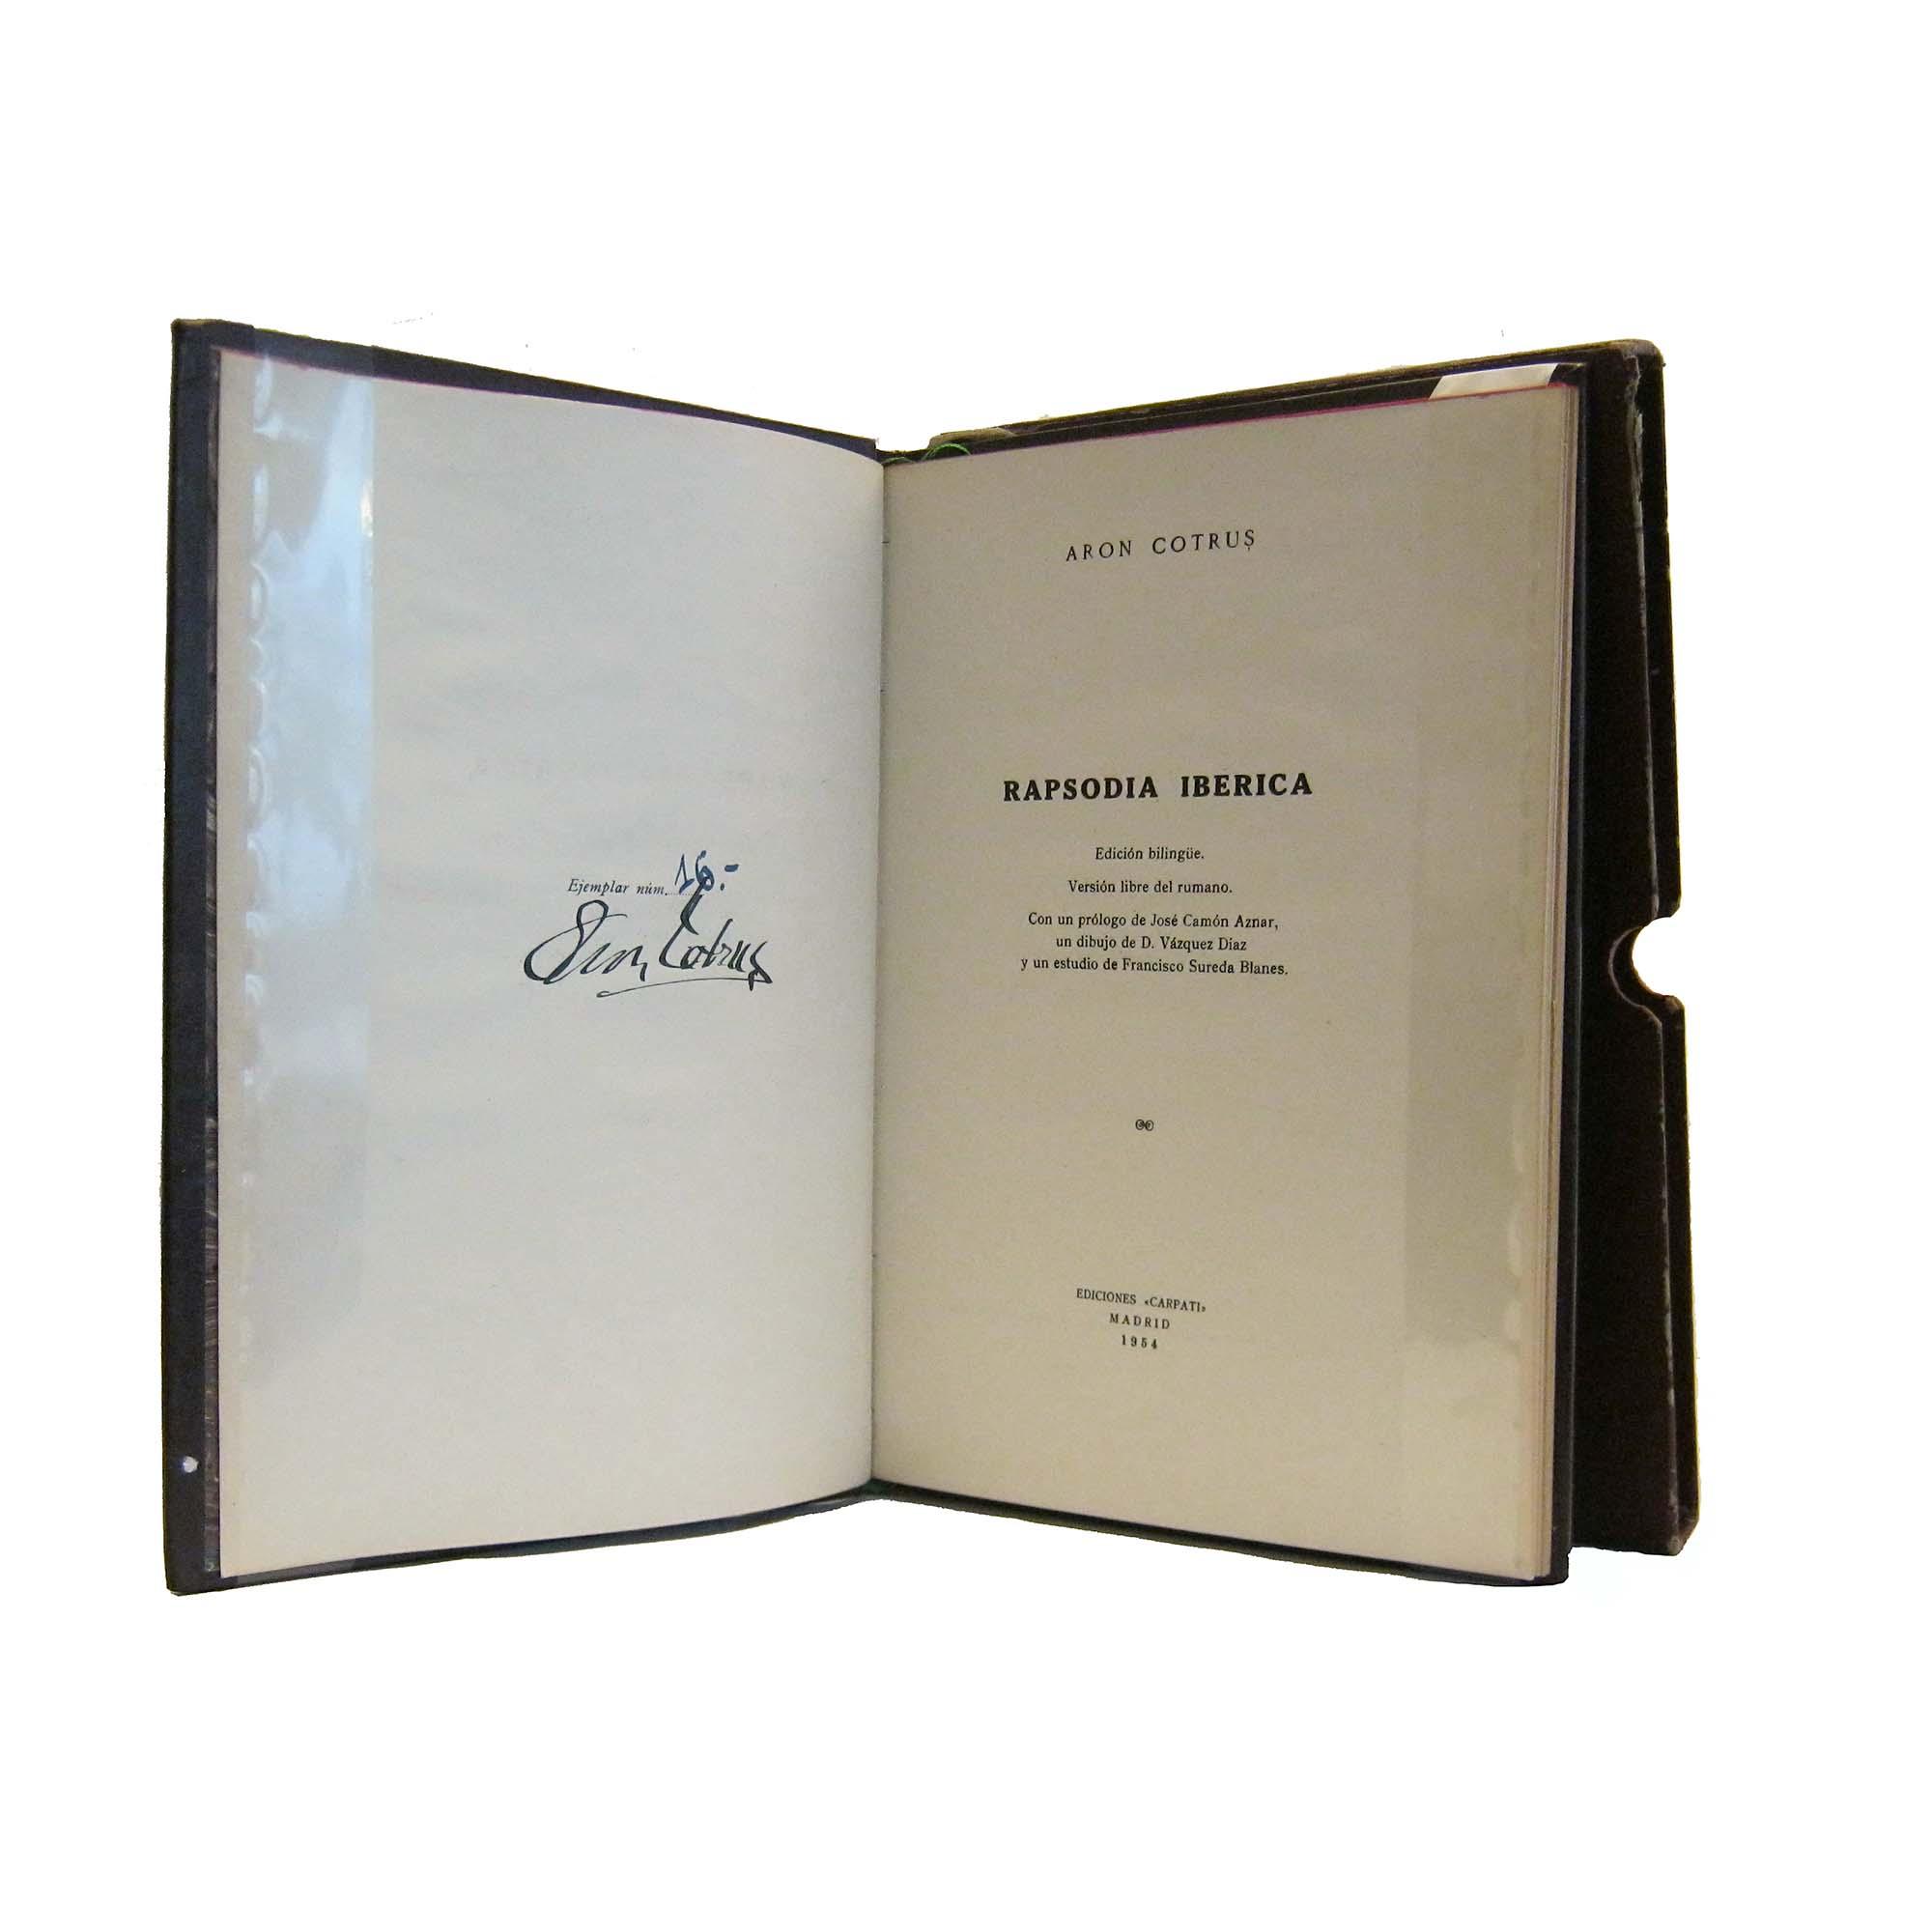 5426-Cotrus-Rapsodia-Iberica-1954-Titel-Autograf-N.jpg